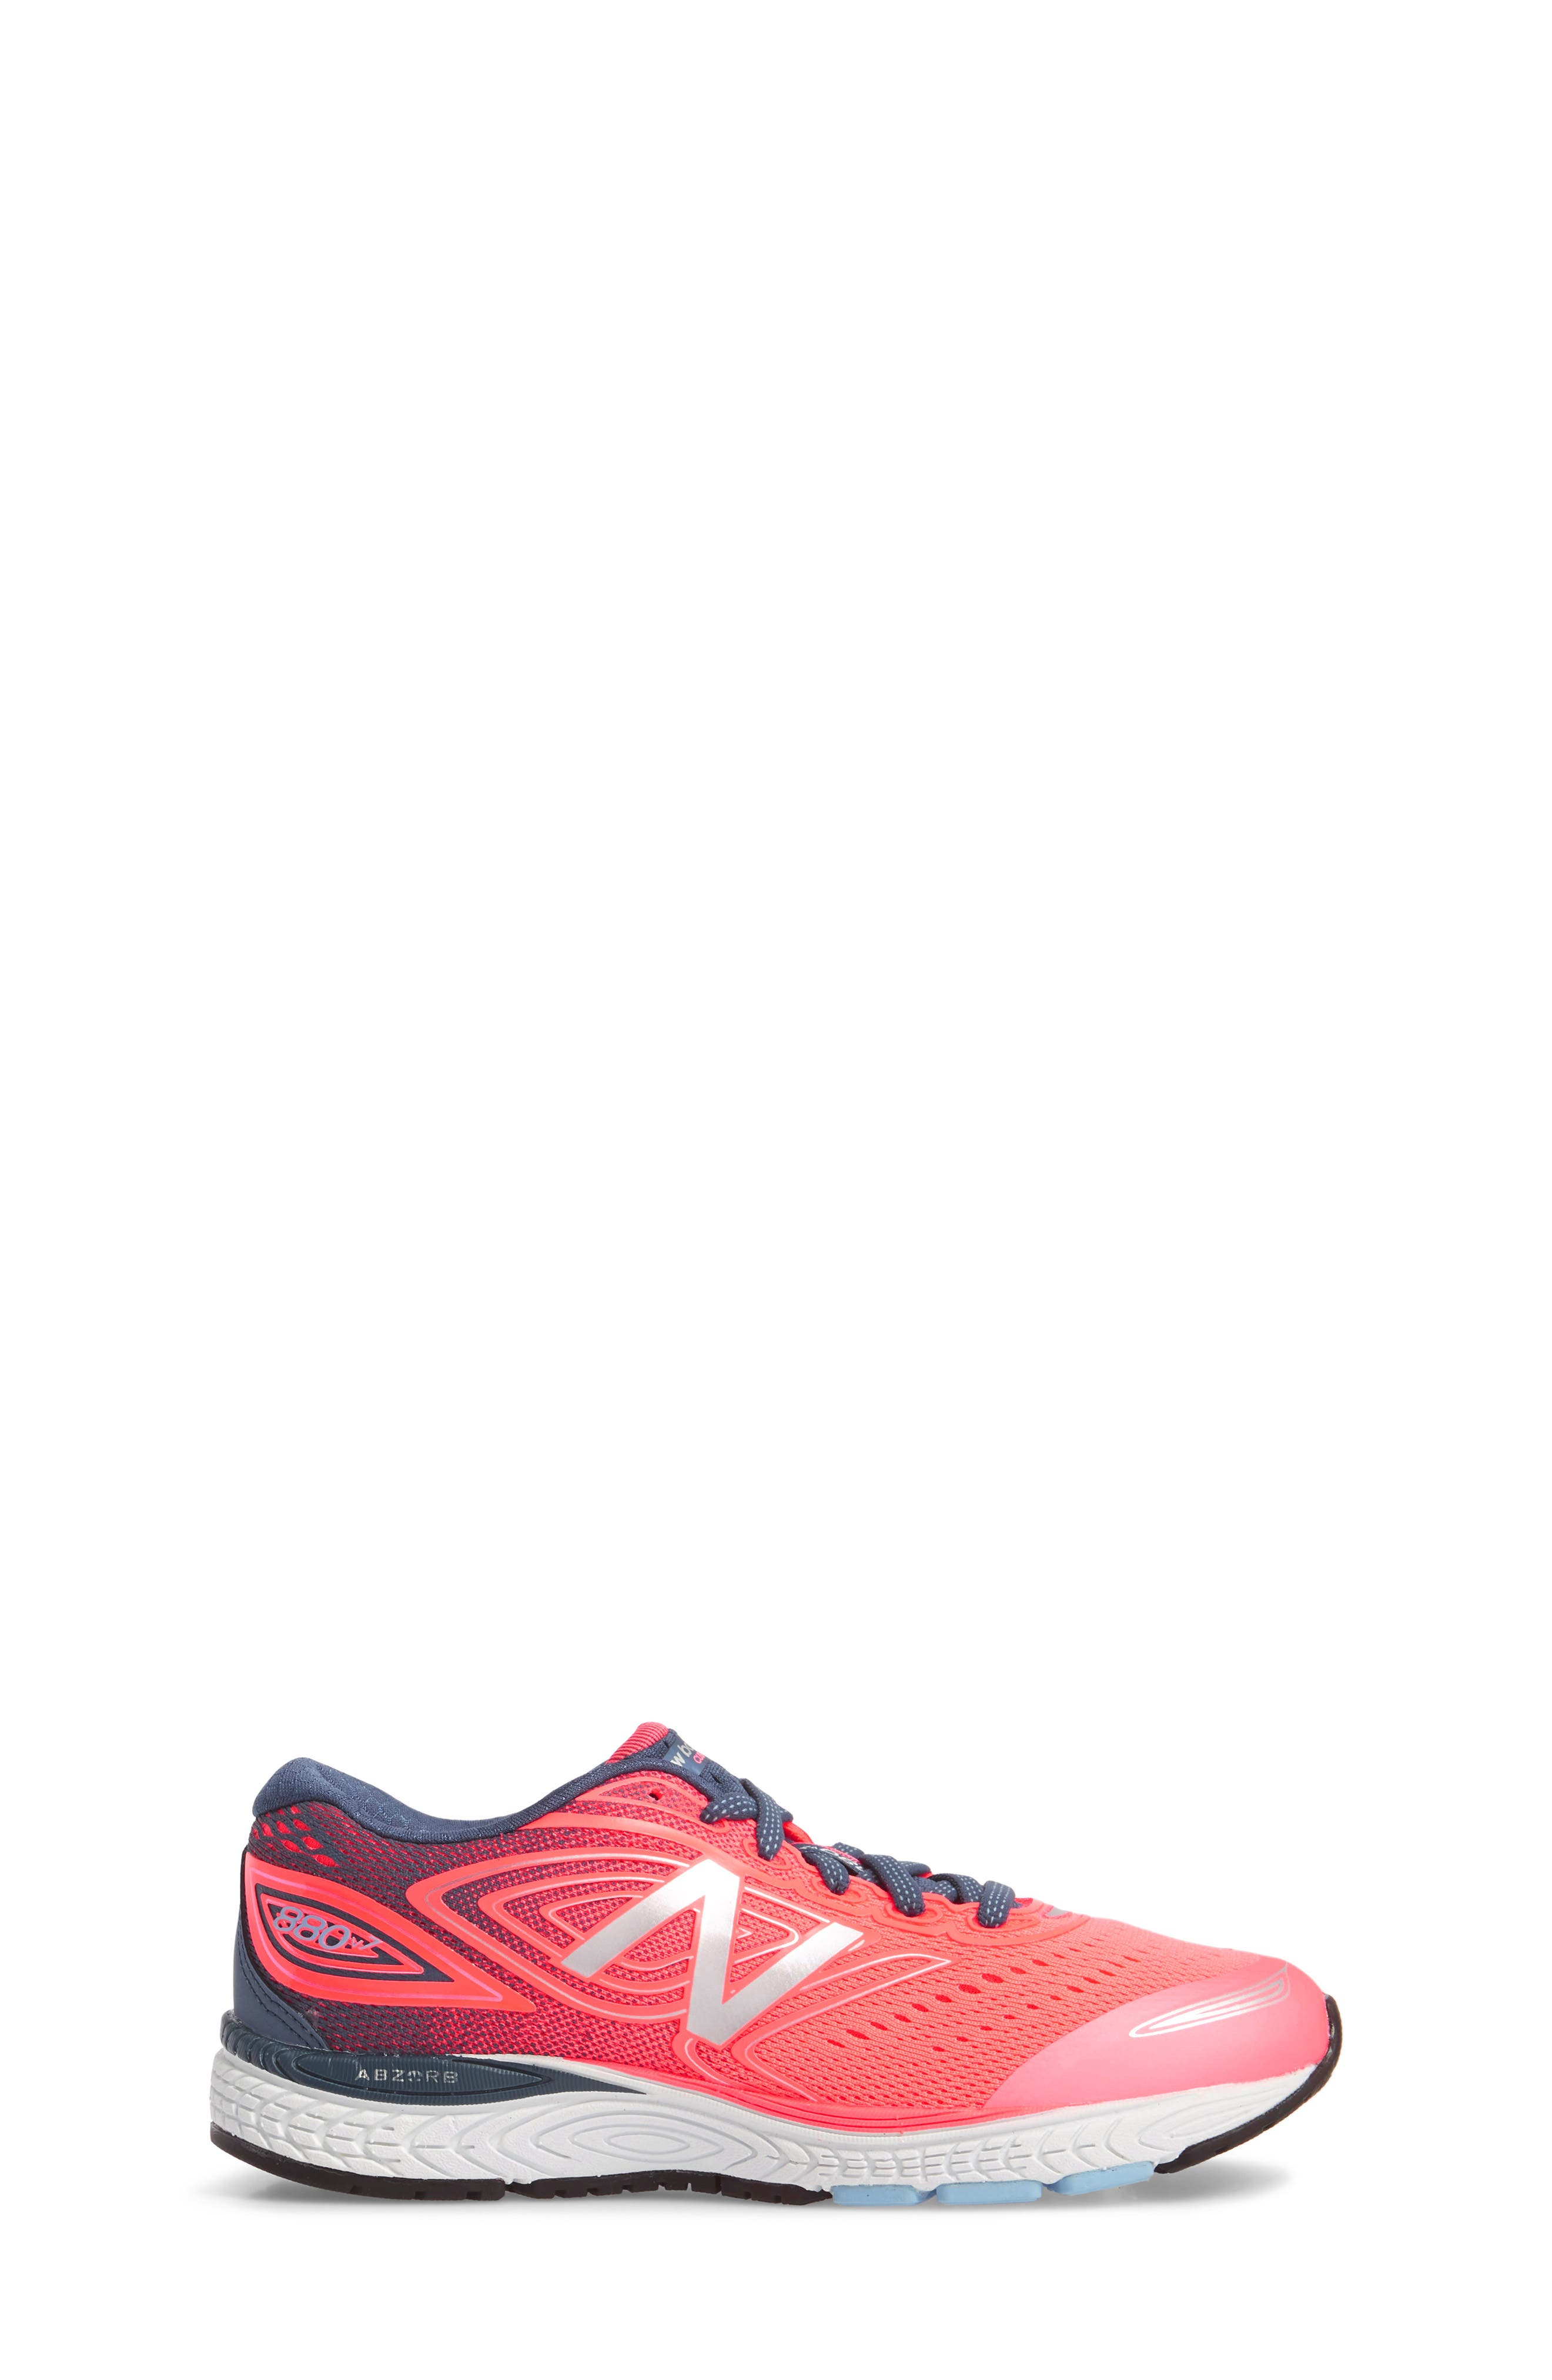 880v7 Sneaker,                             Alternate thumbnail 3, color,                             Guava